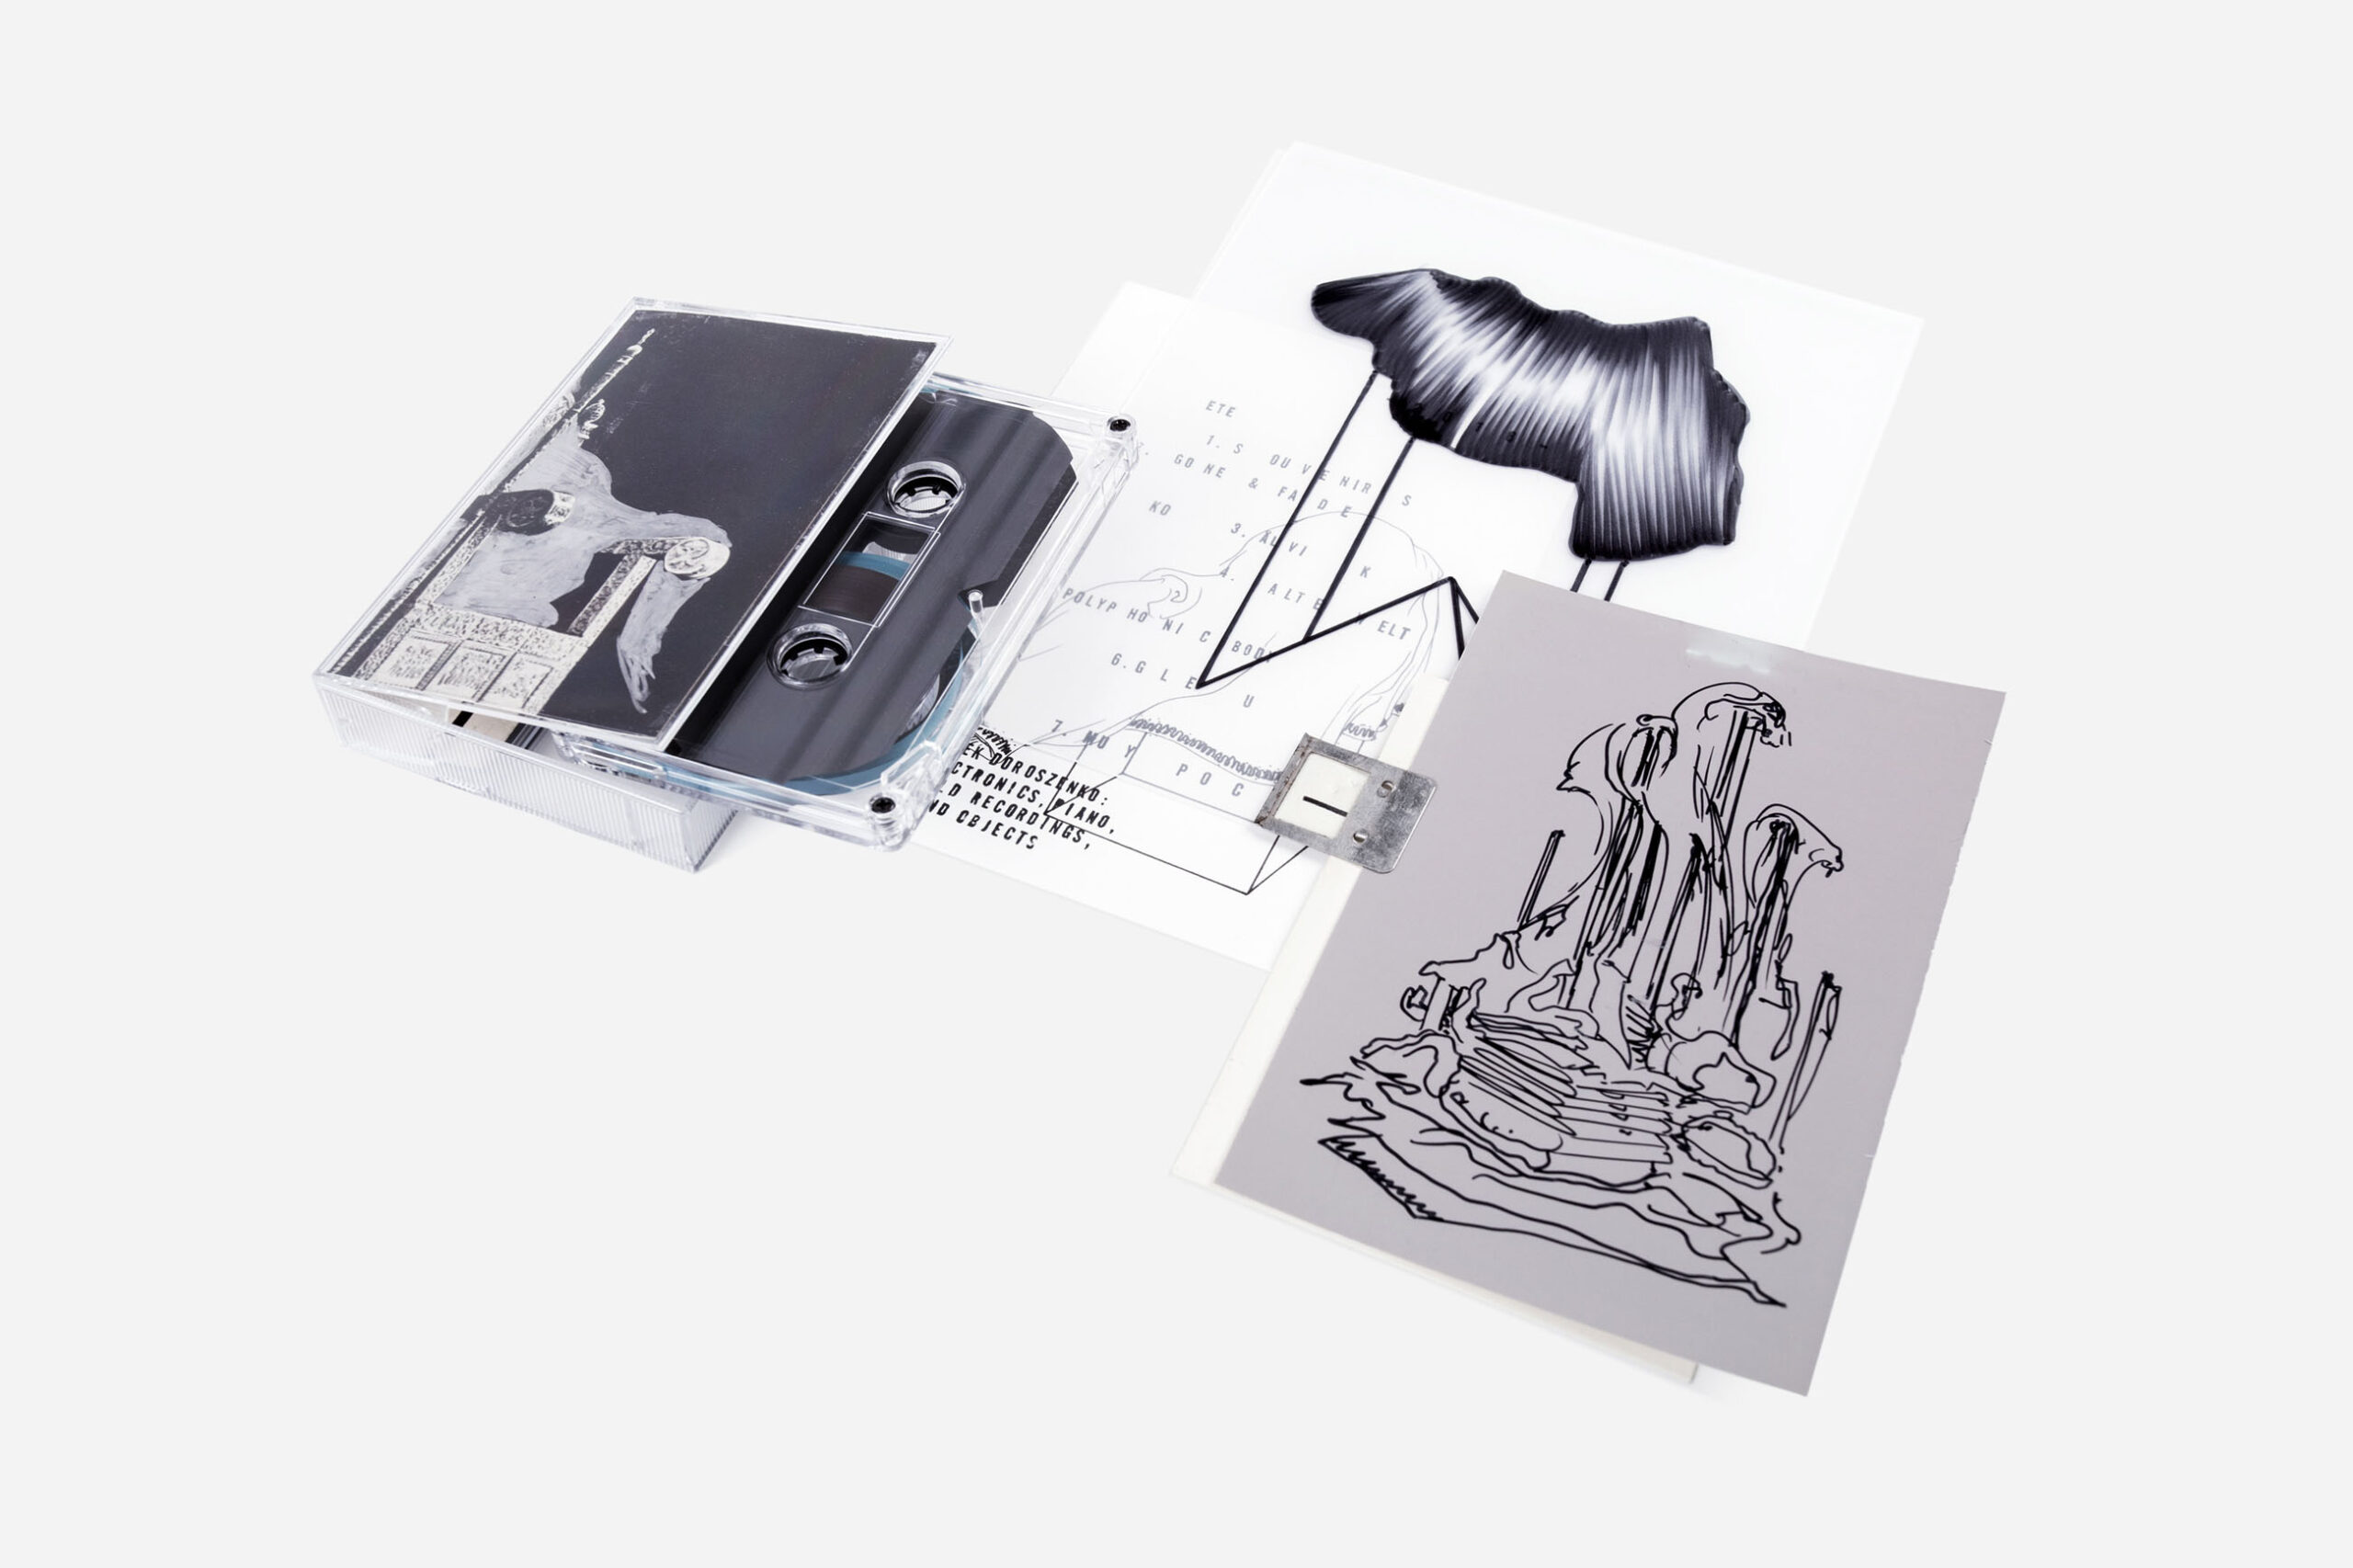 Jacek Doroszenko - Useful Remnants, music album 04